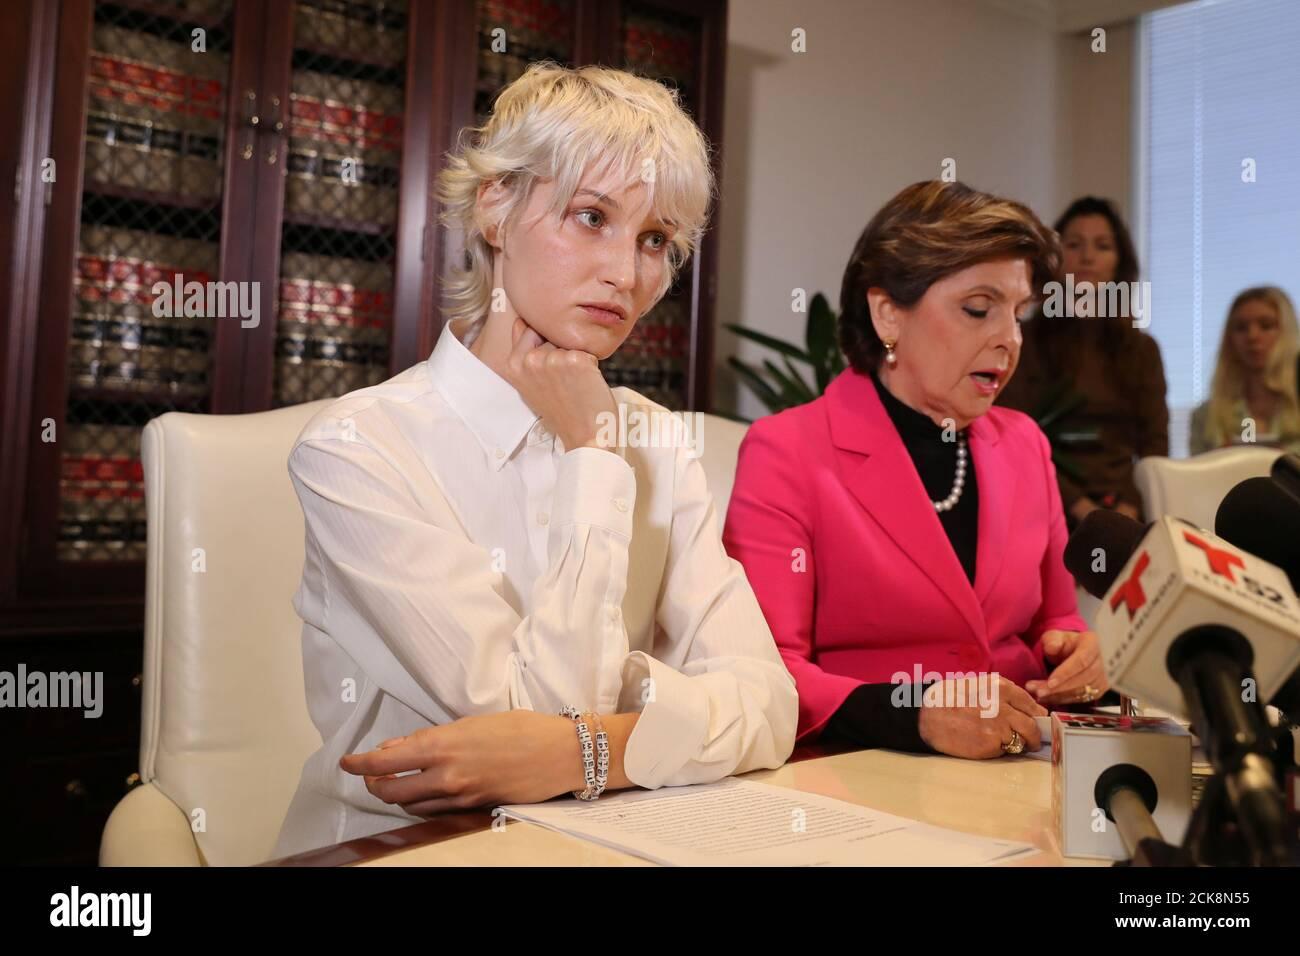 Jane Doe 15 A 31 Year Old Unidentified Woman Who Accuses The Late Financier Jeffrey Epstein